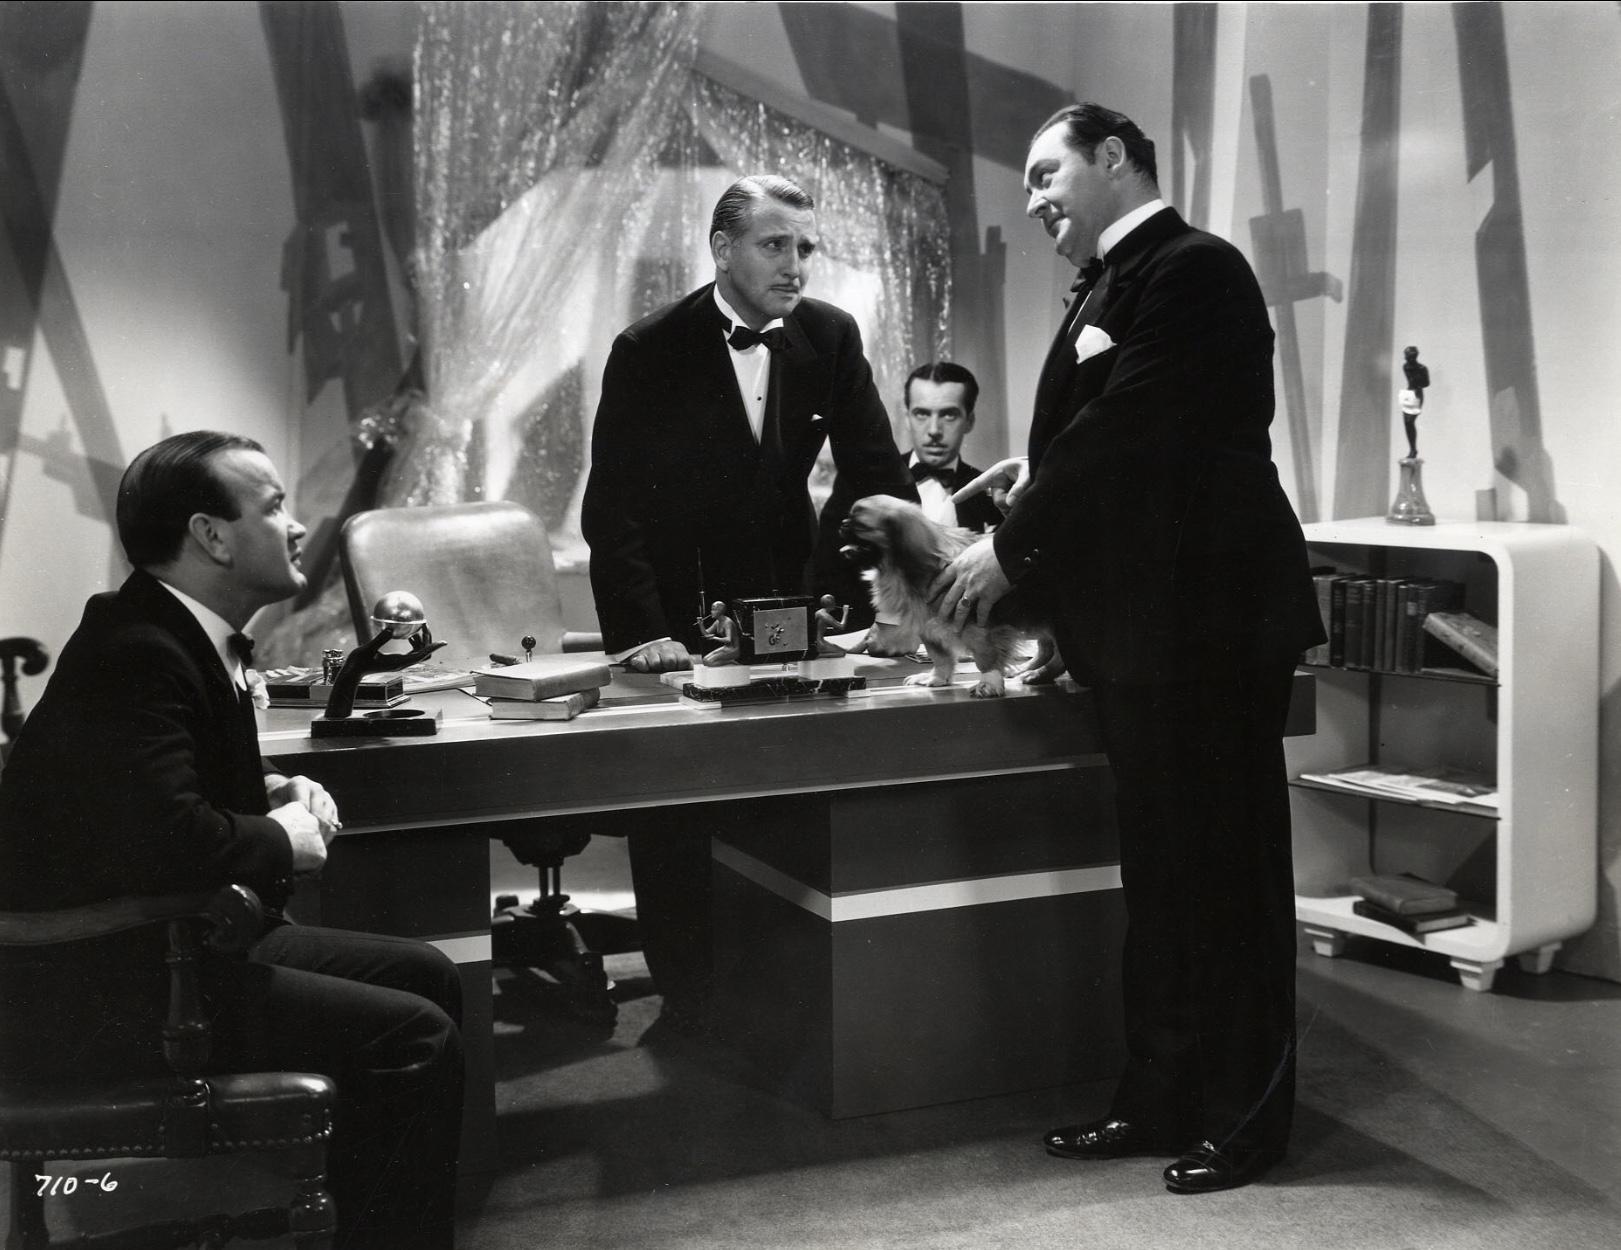 Edward Arnold, Robert Gleckler, and Bradley Page in Million Dollar Ransom (1934)